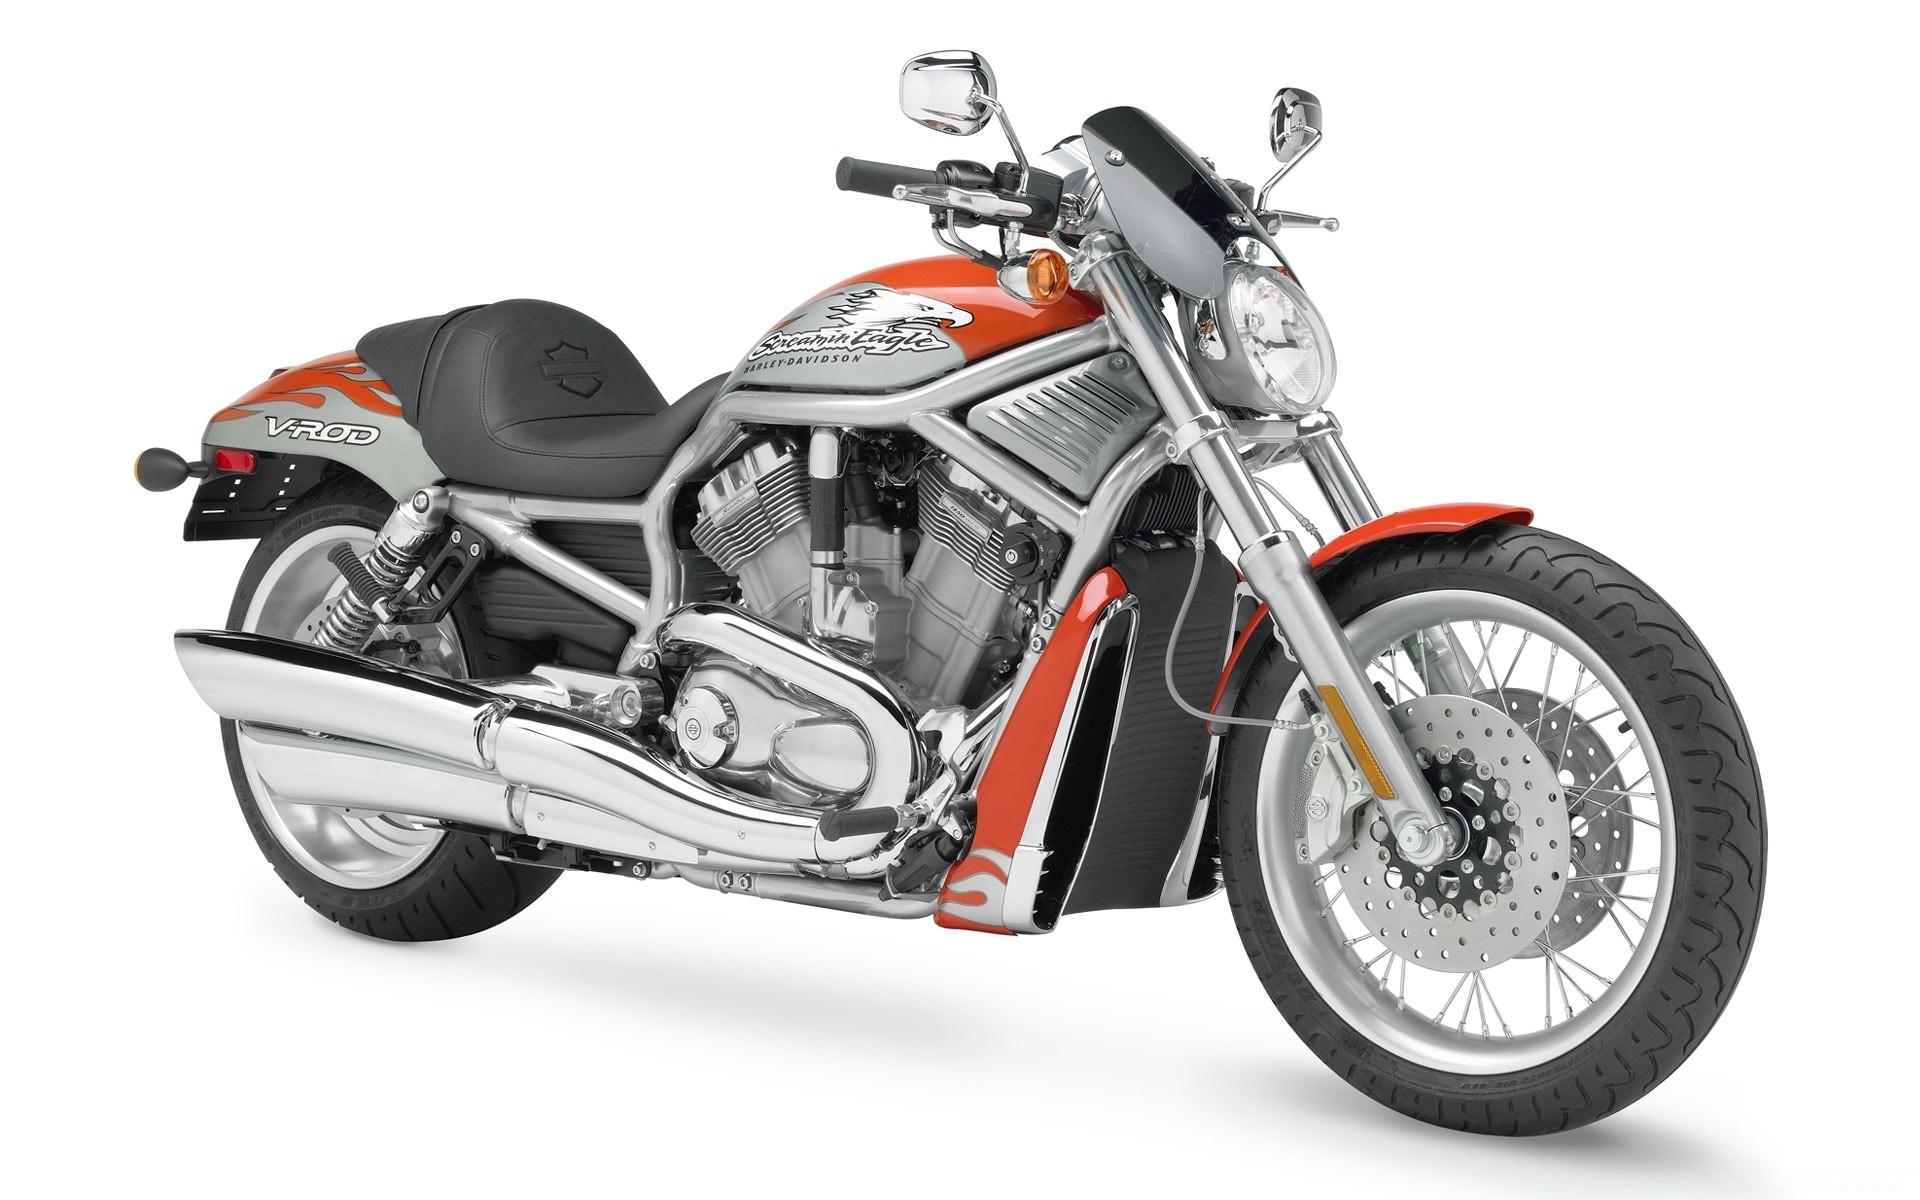 Harley Davidson Vrscaw V Rod Motorcycle 2 Phone Wallpapers